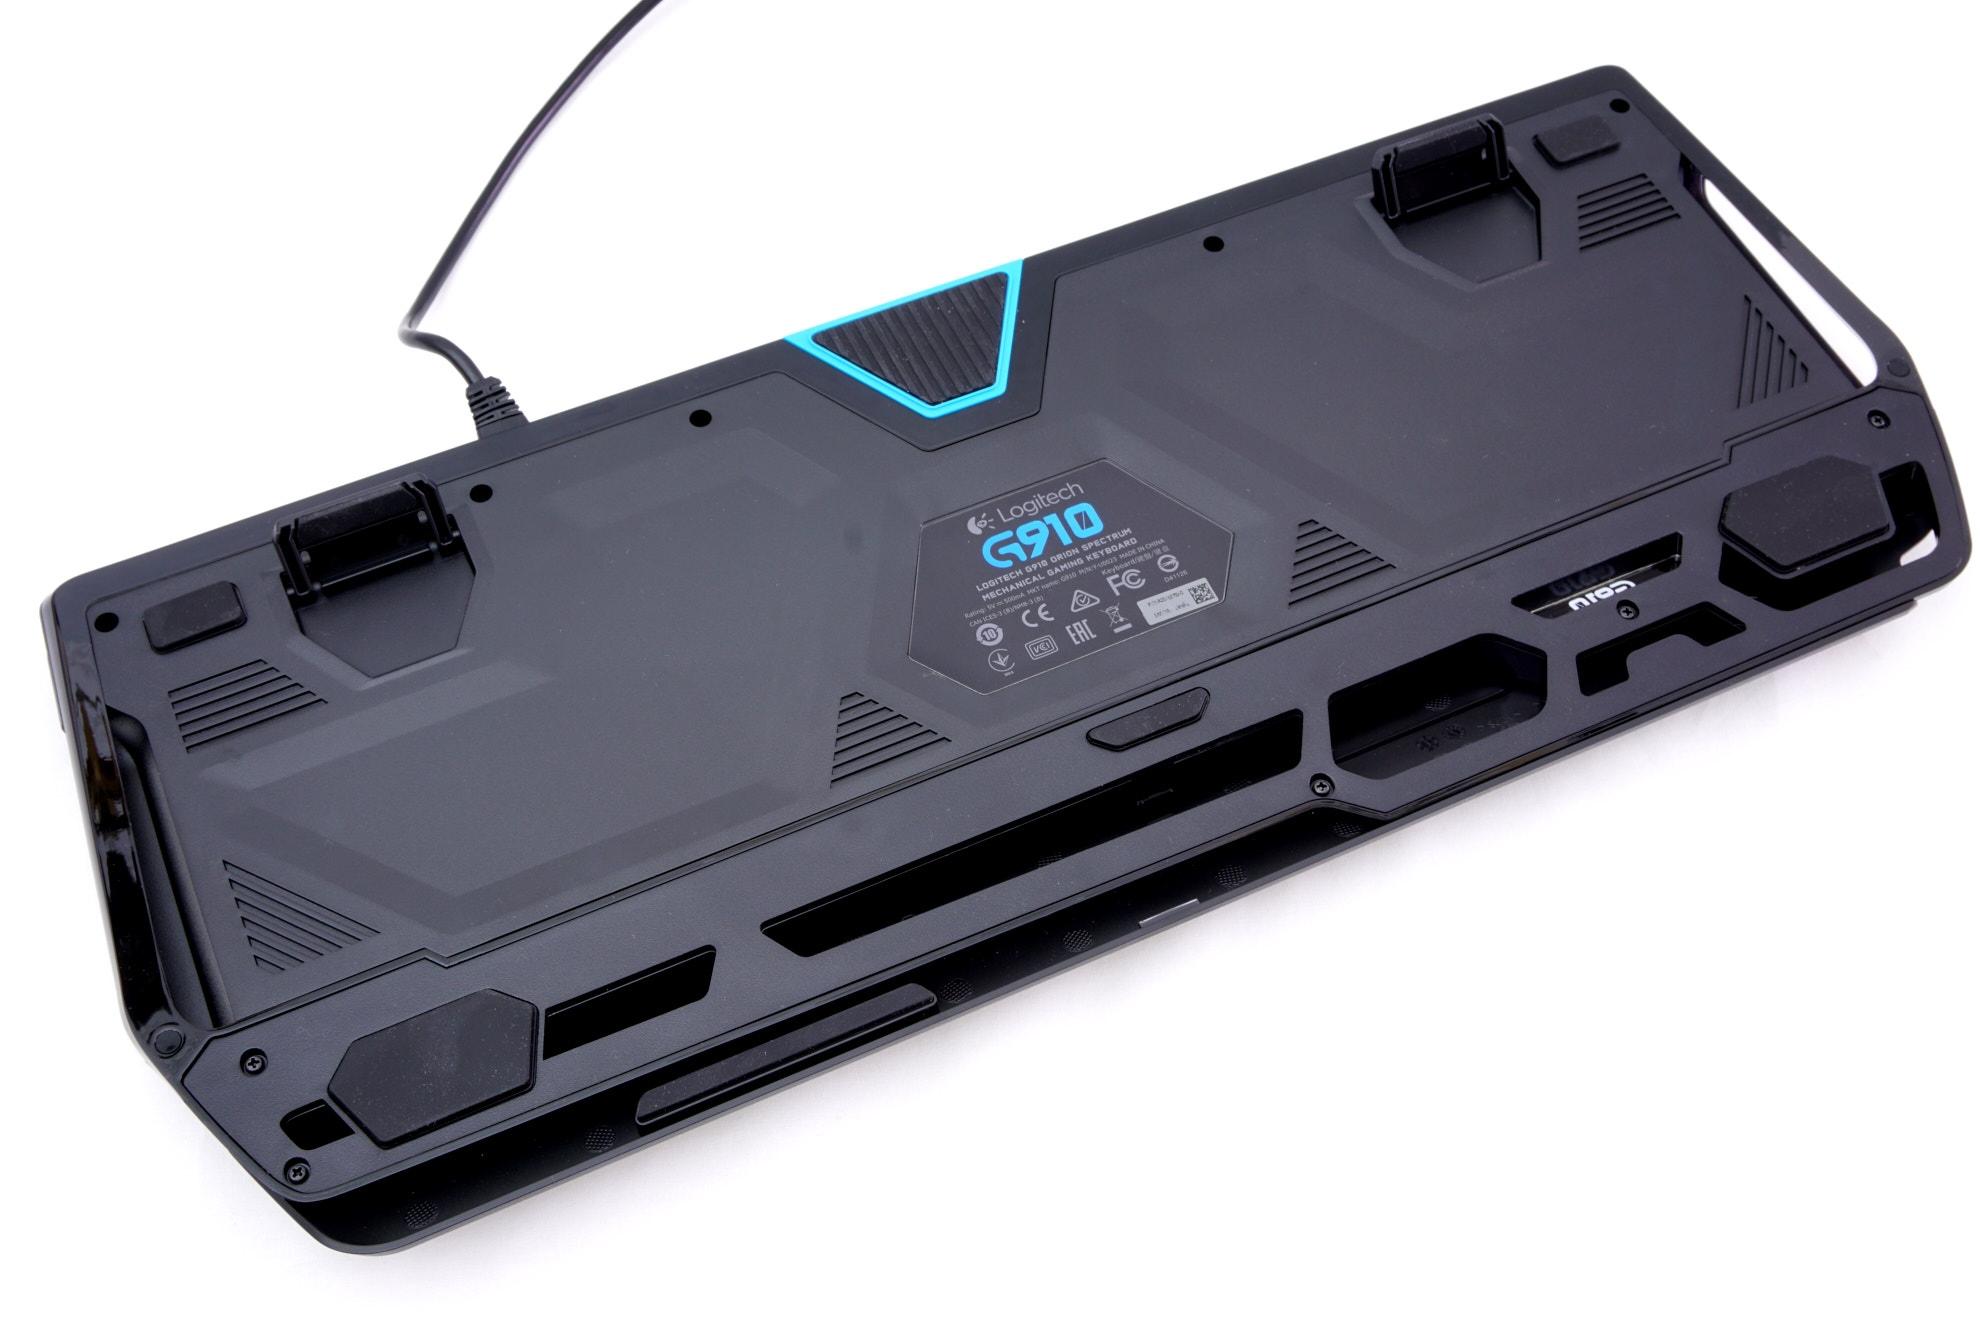 The Logitech G910 Orion Spectrum Mechanical Gaming Keyboard